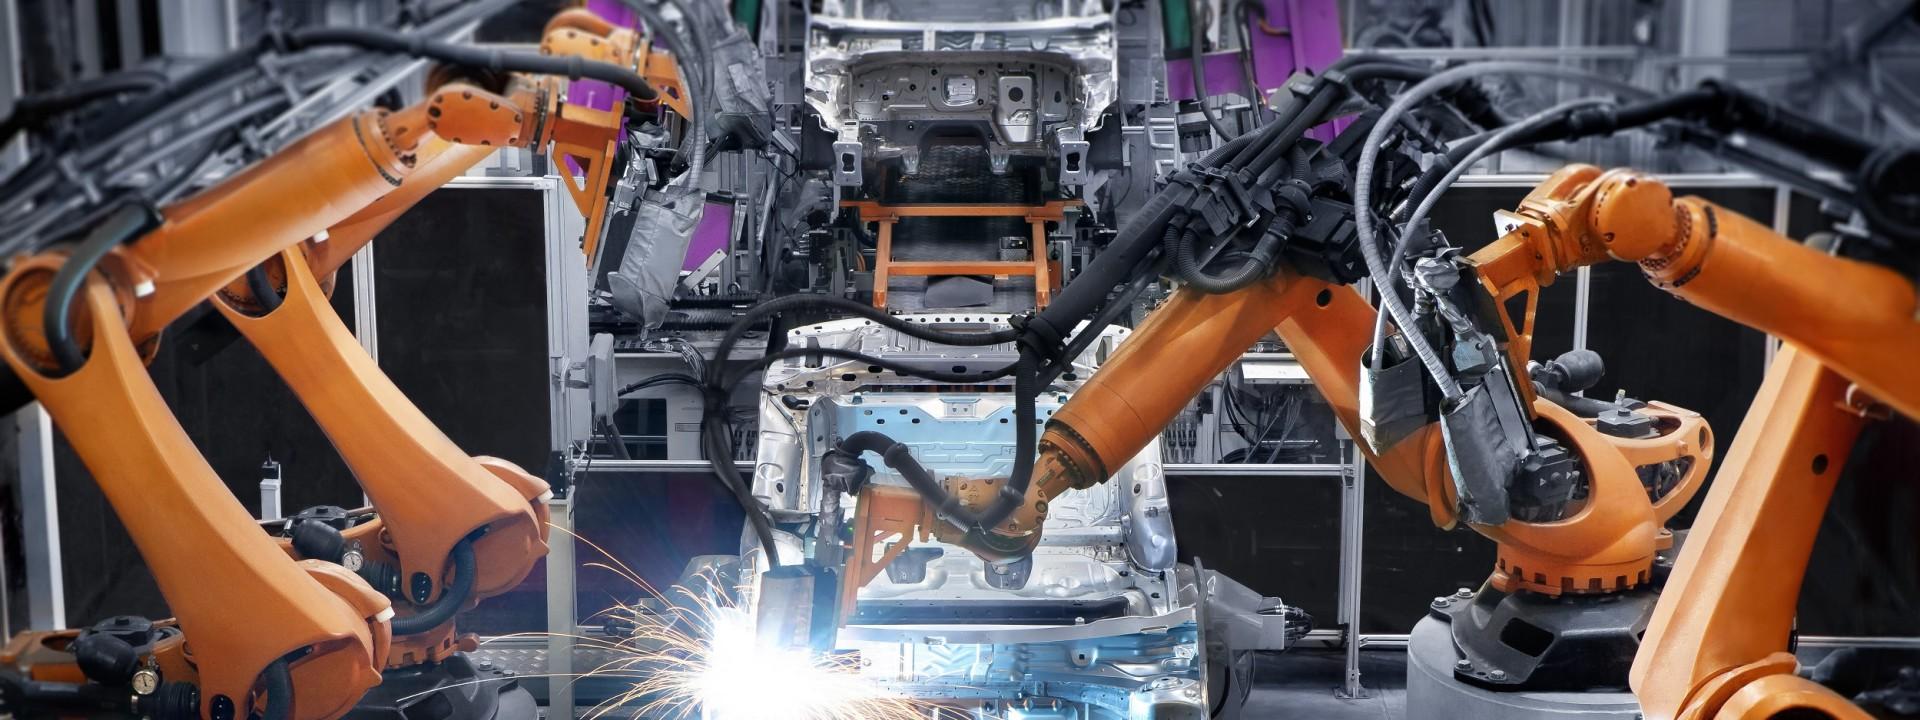 Functional Safety of Machinery | TÜV Rheinland